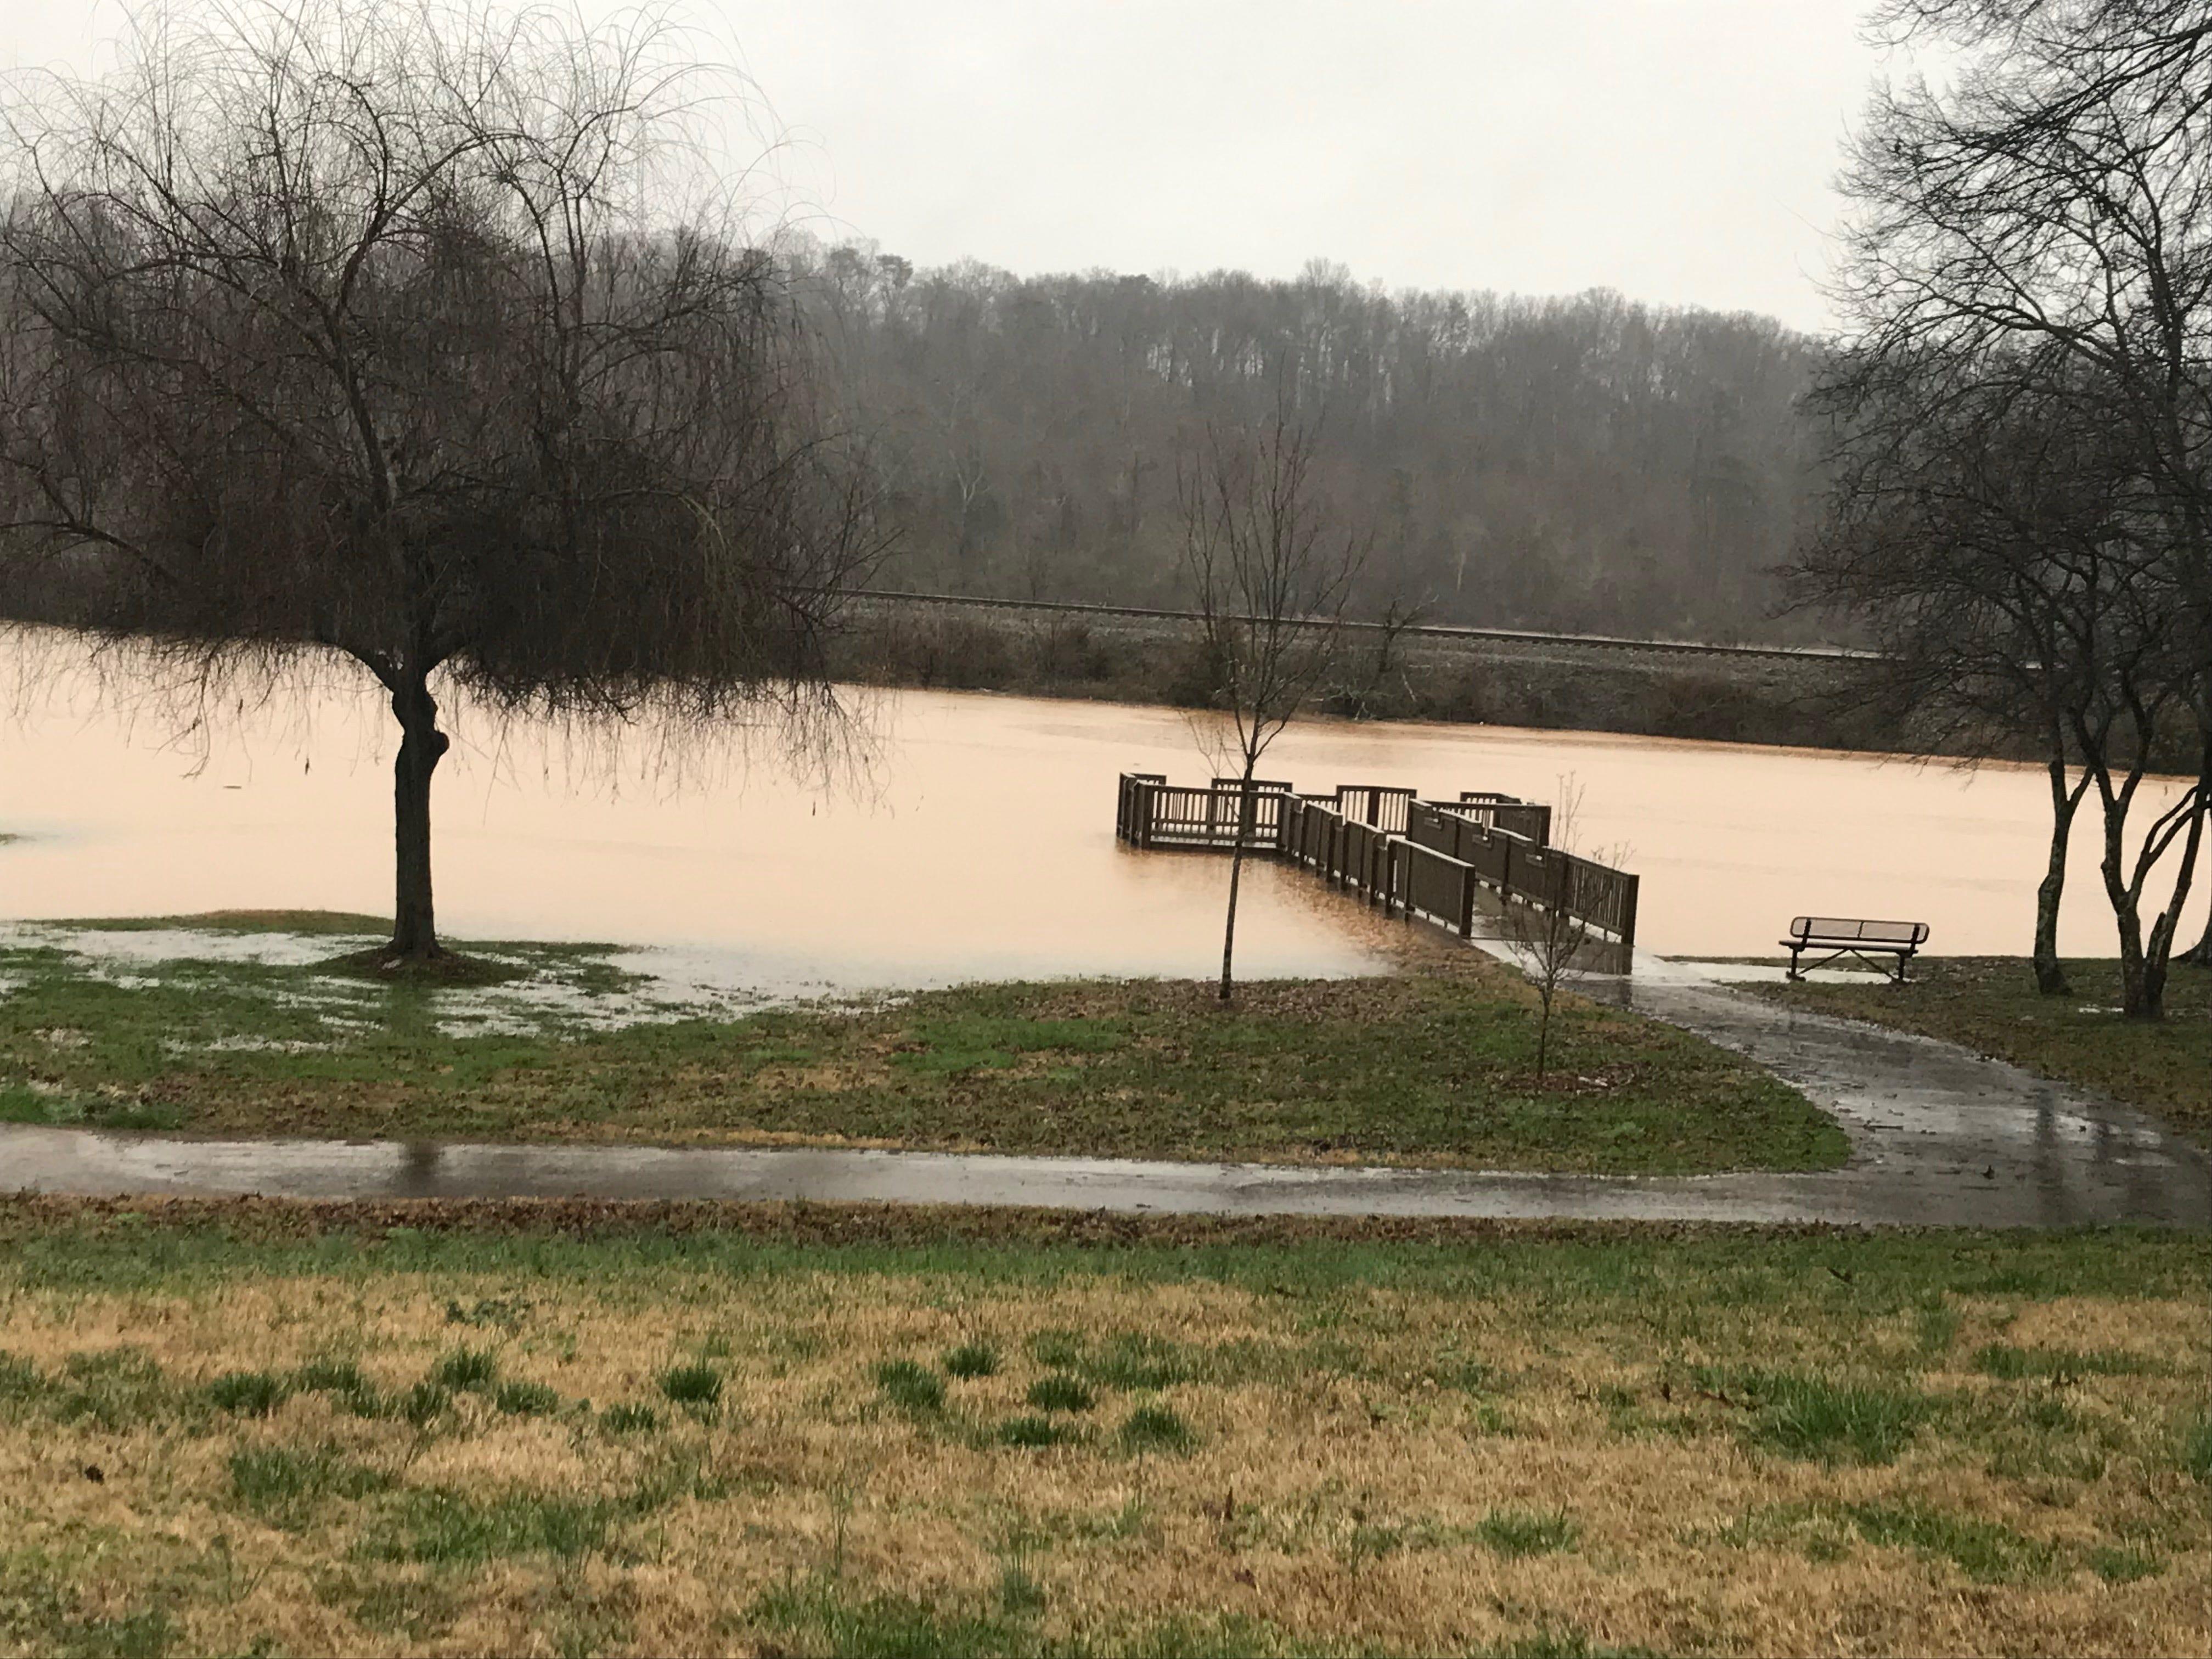 Flooding at Anchor Park in Farragut, TN